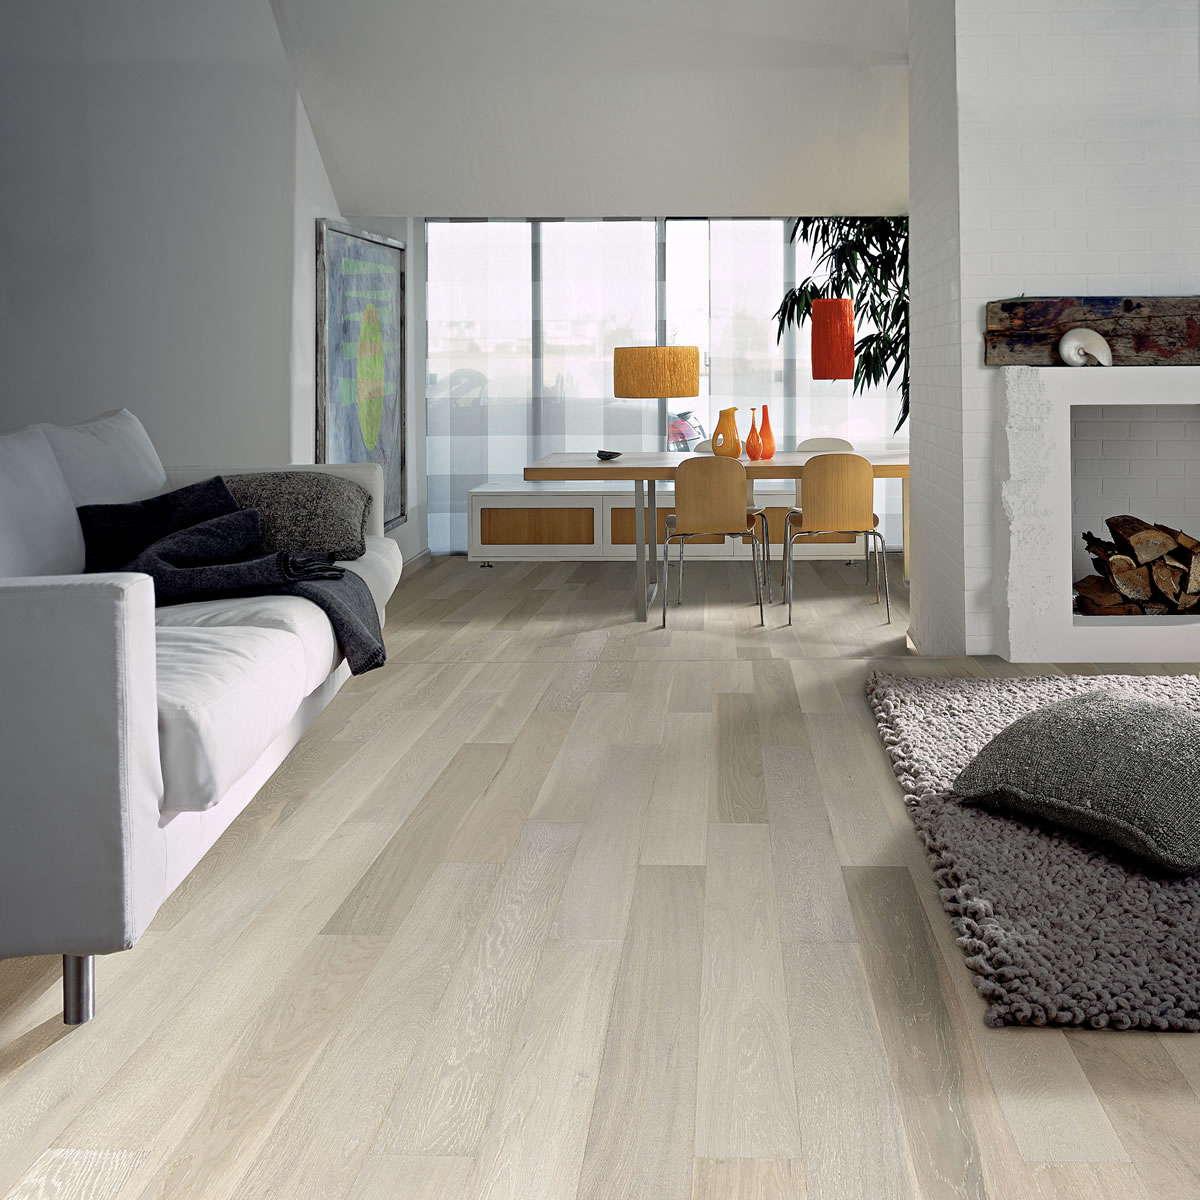 image oak oyster hardwood artisan collection kahrs floor flooring usa room